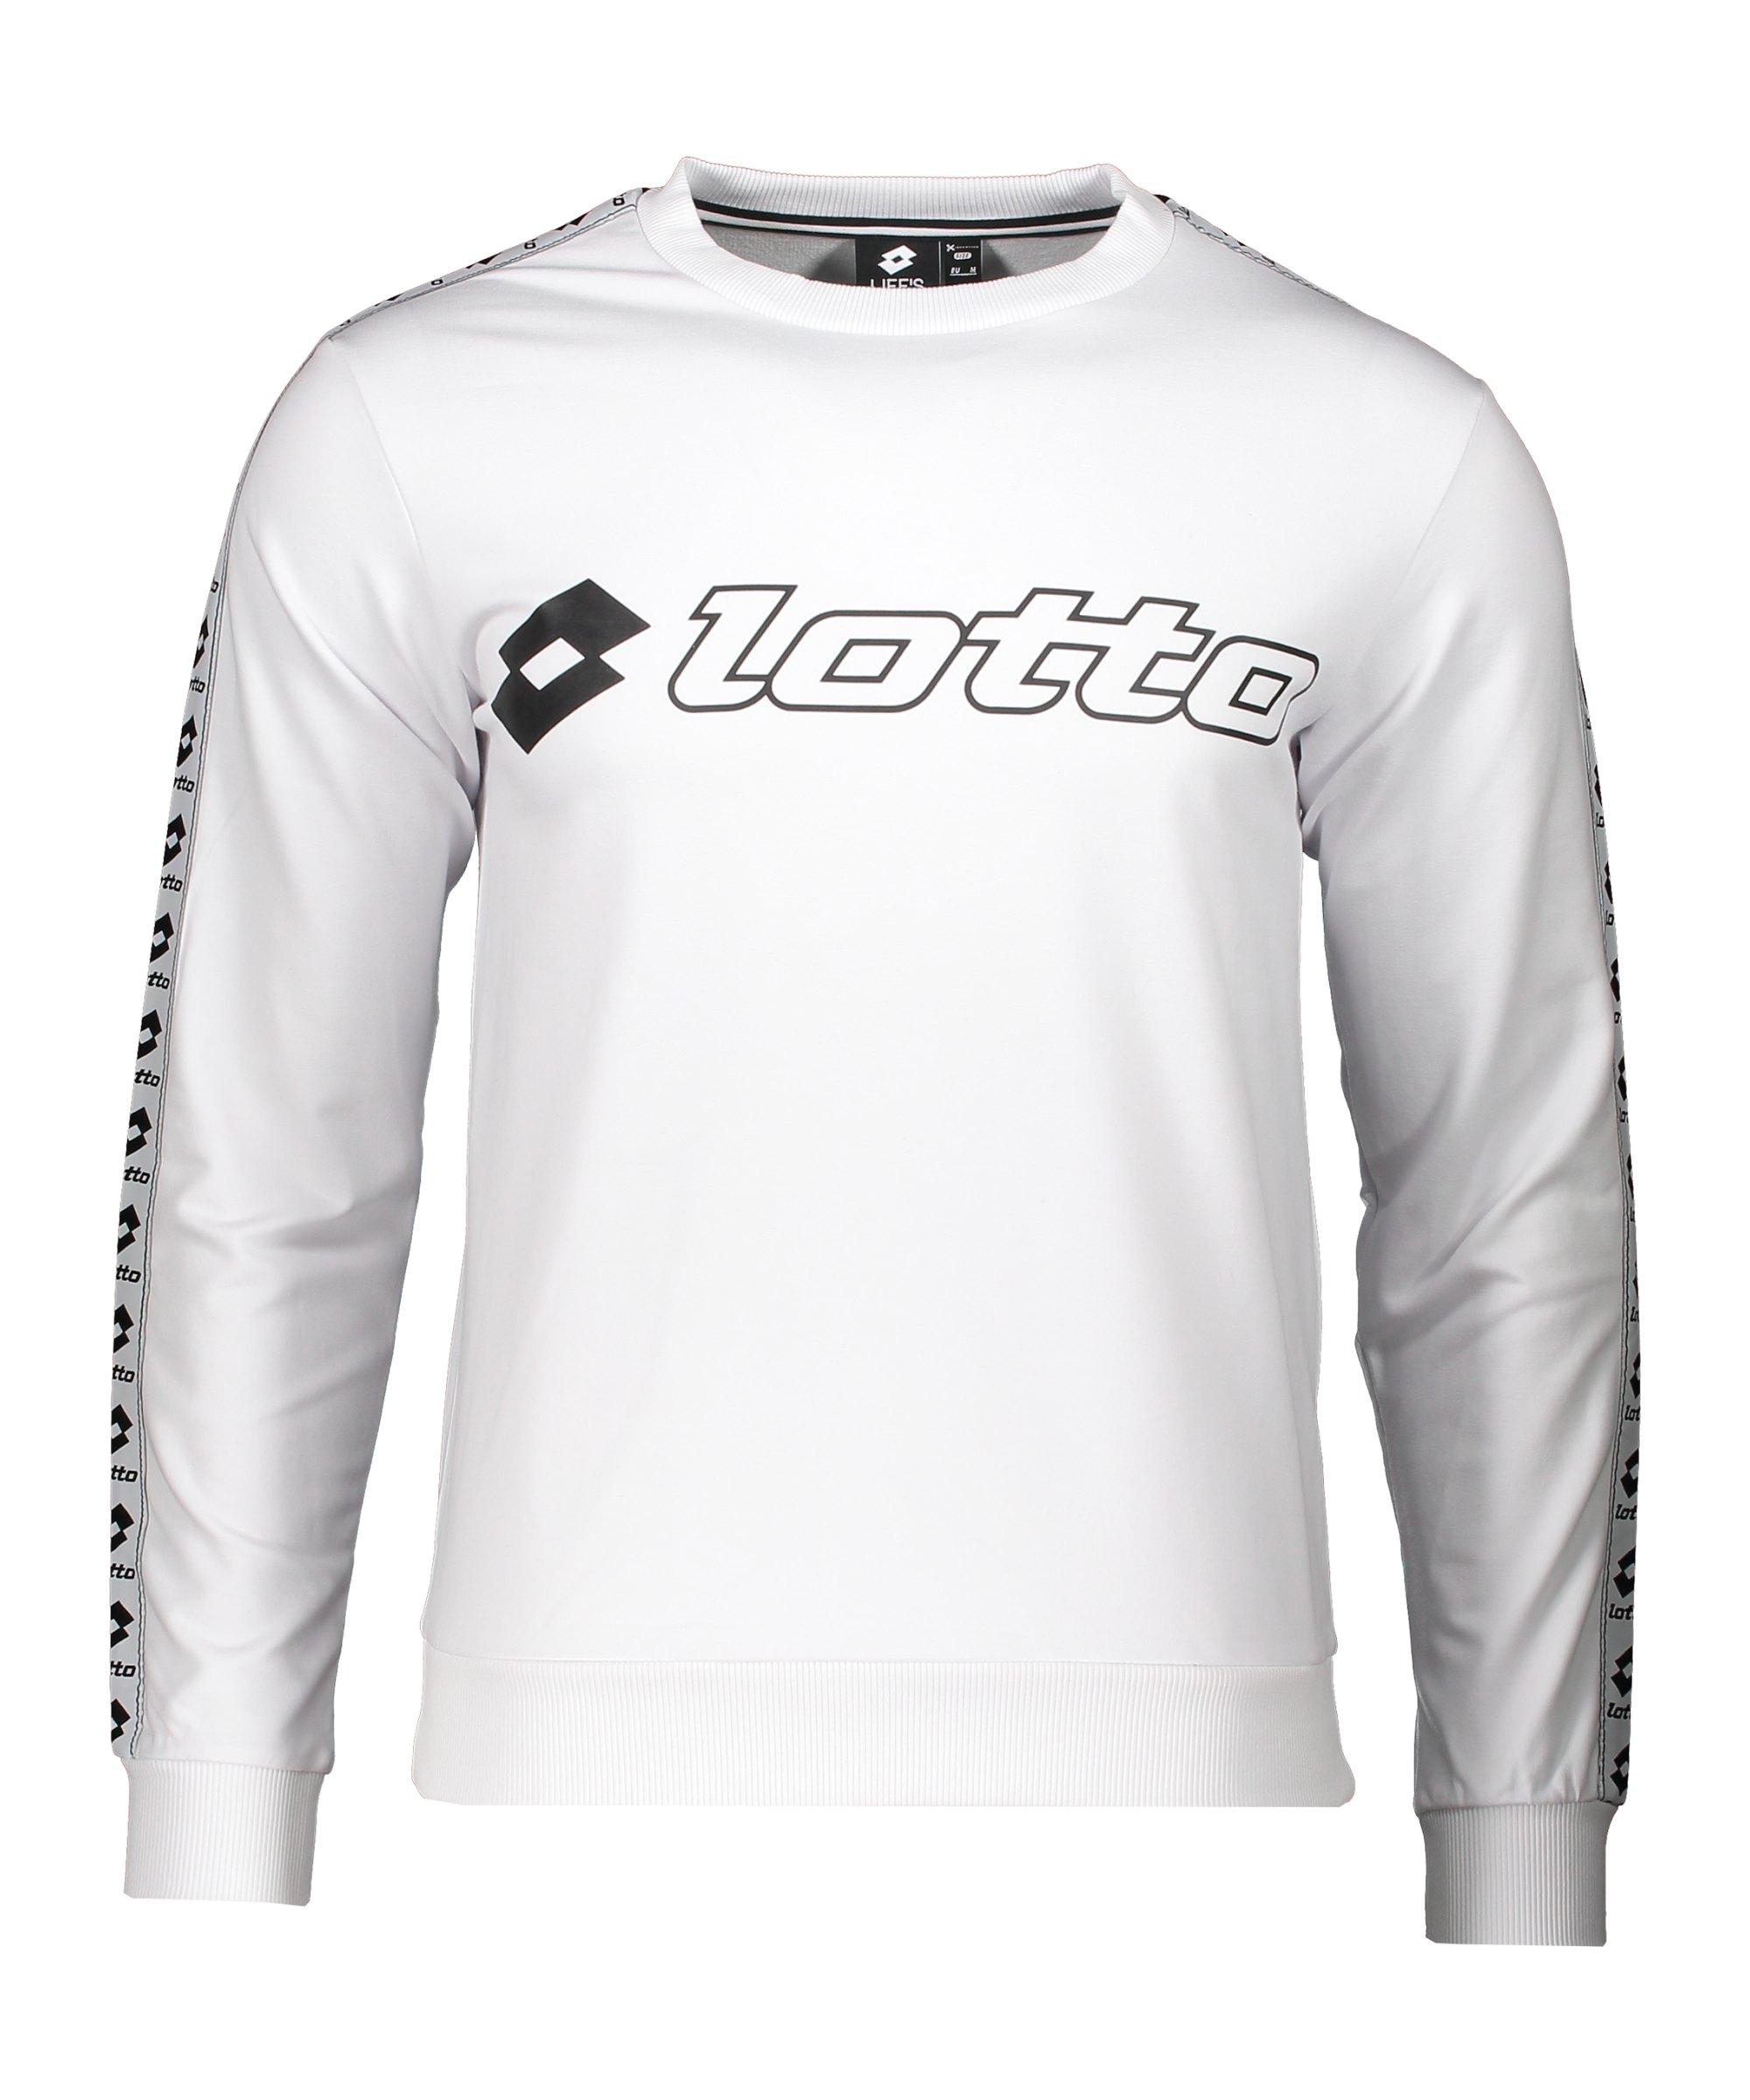 Lotto Athletica Sweatshirt Weiss F0F1 - weiss